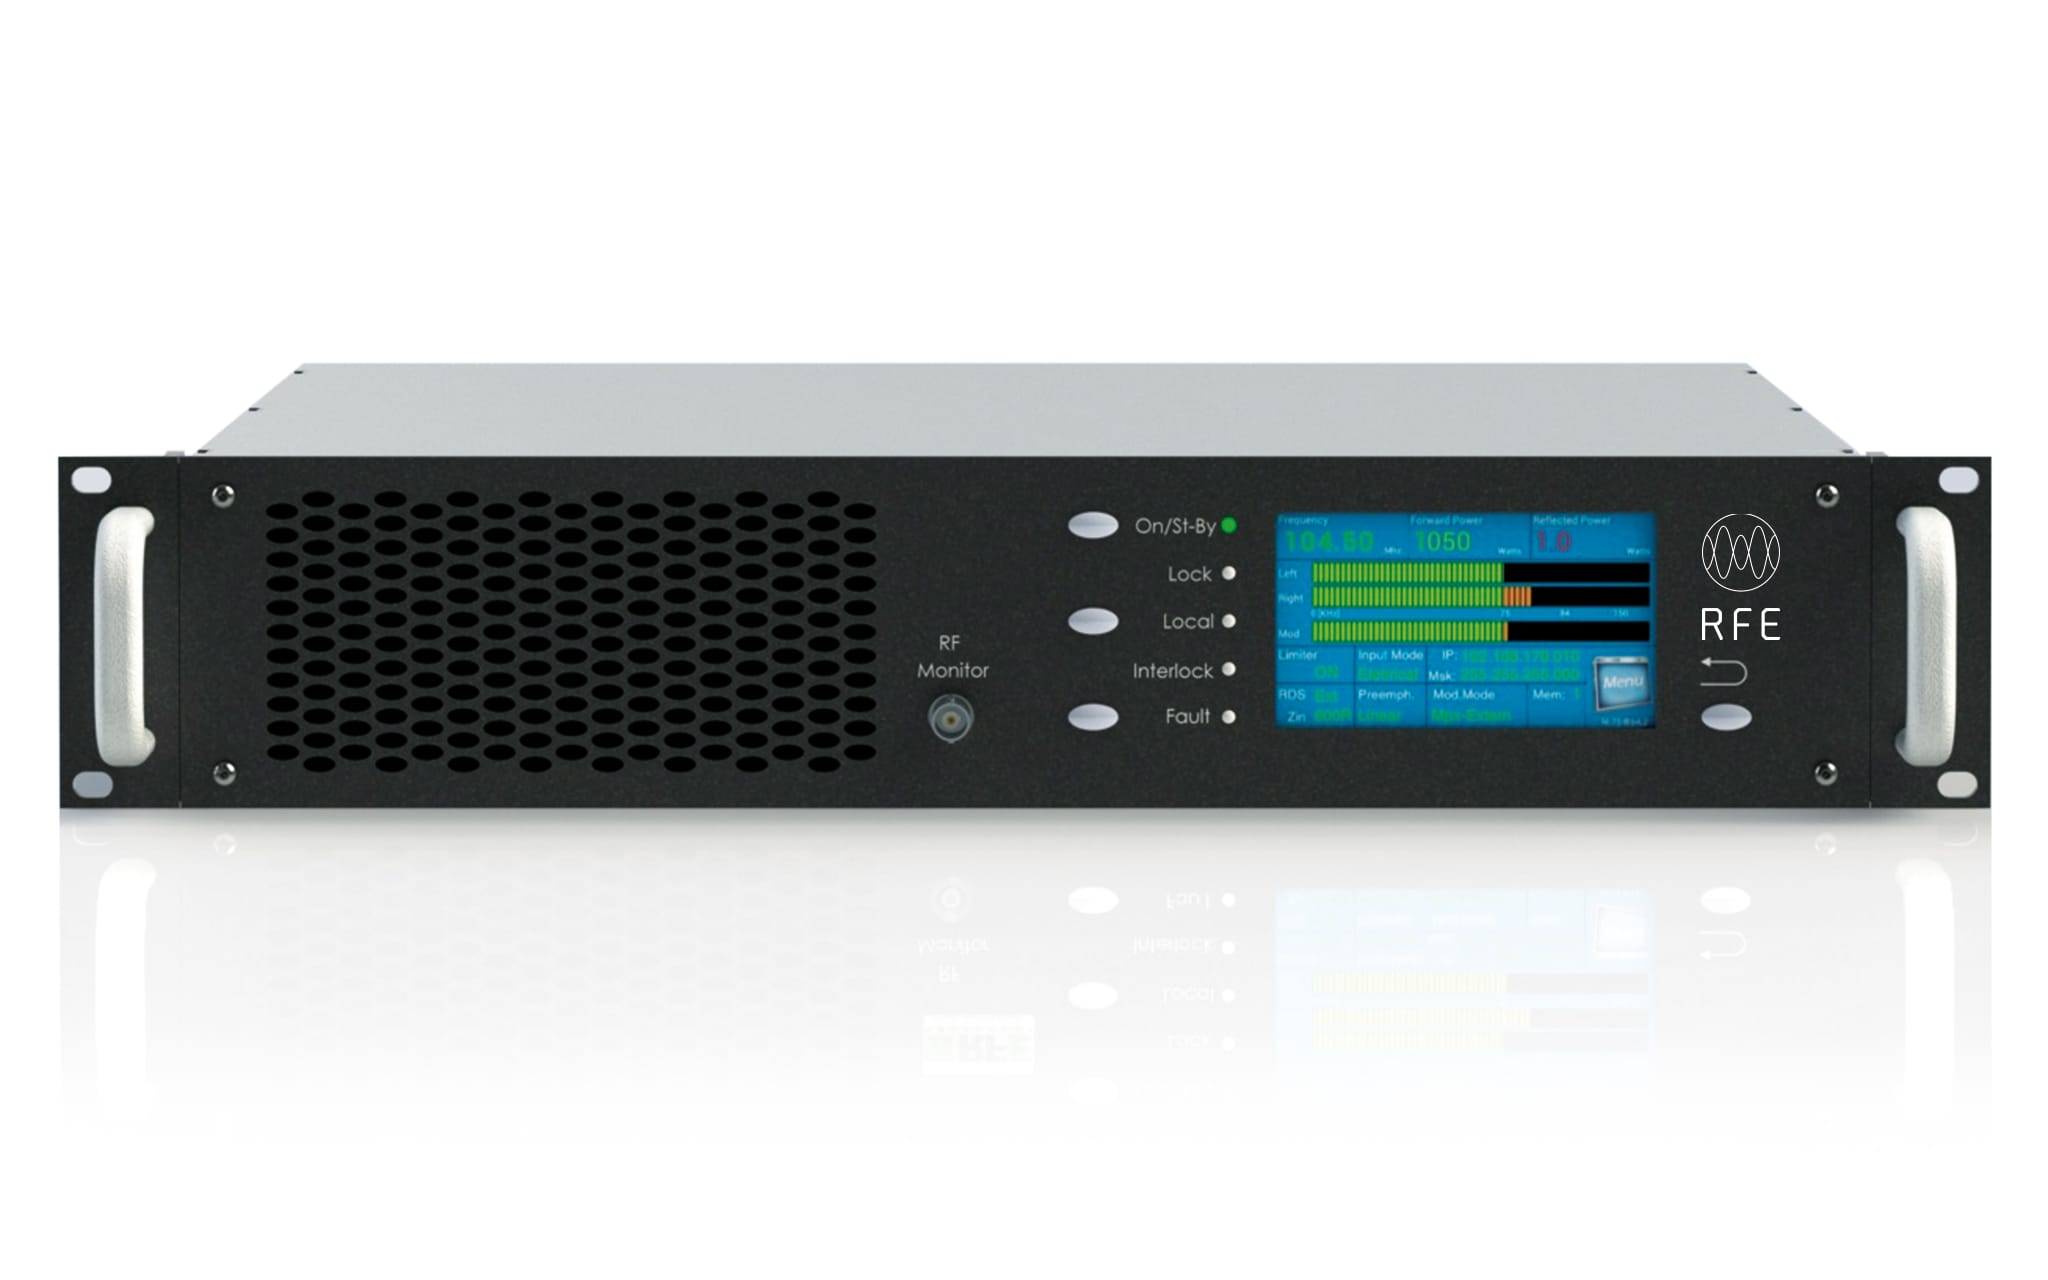 DS Series Low Power - RFE Broadcast